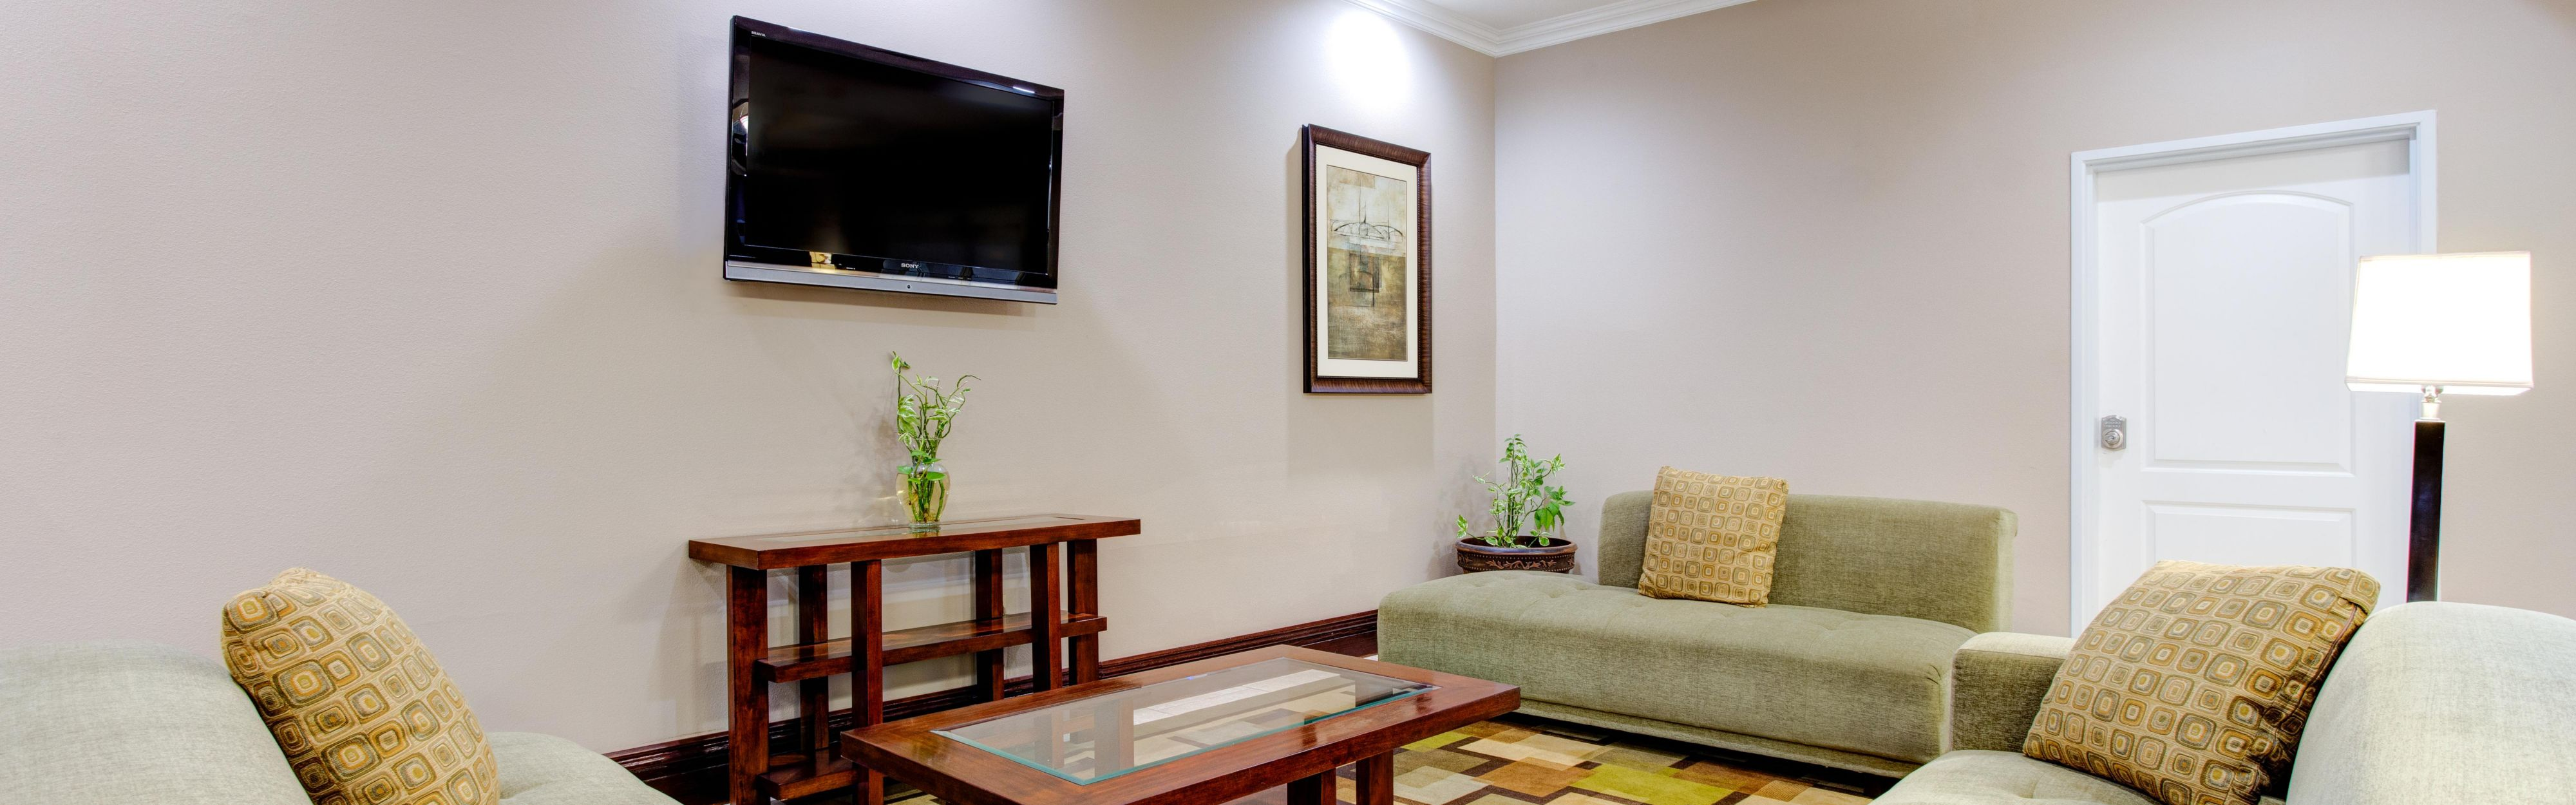 ... Lobby Lounge Holiday Inn Express And Suites Cutoff Louisiana ...